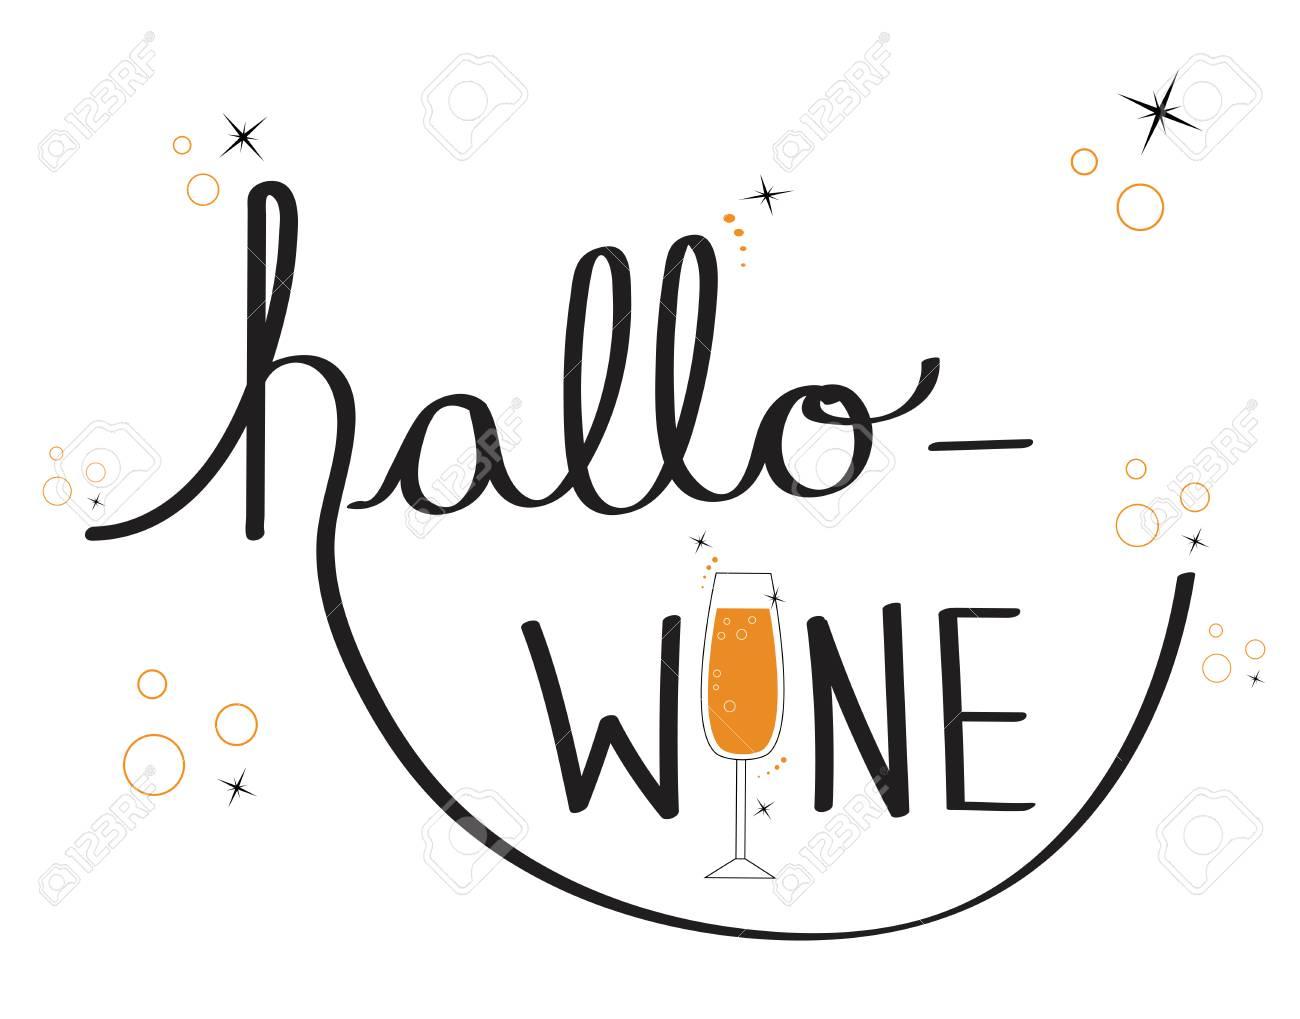 Happy Halloween with Hallo Wine lettering vector.